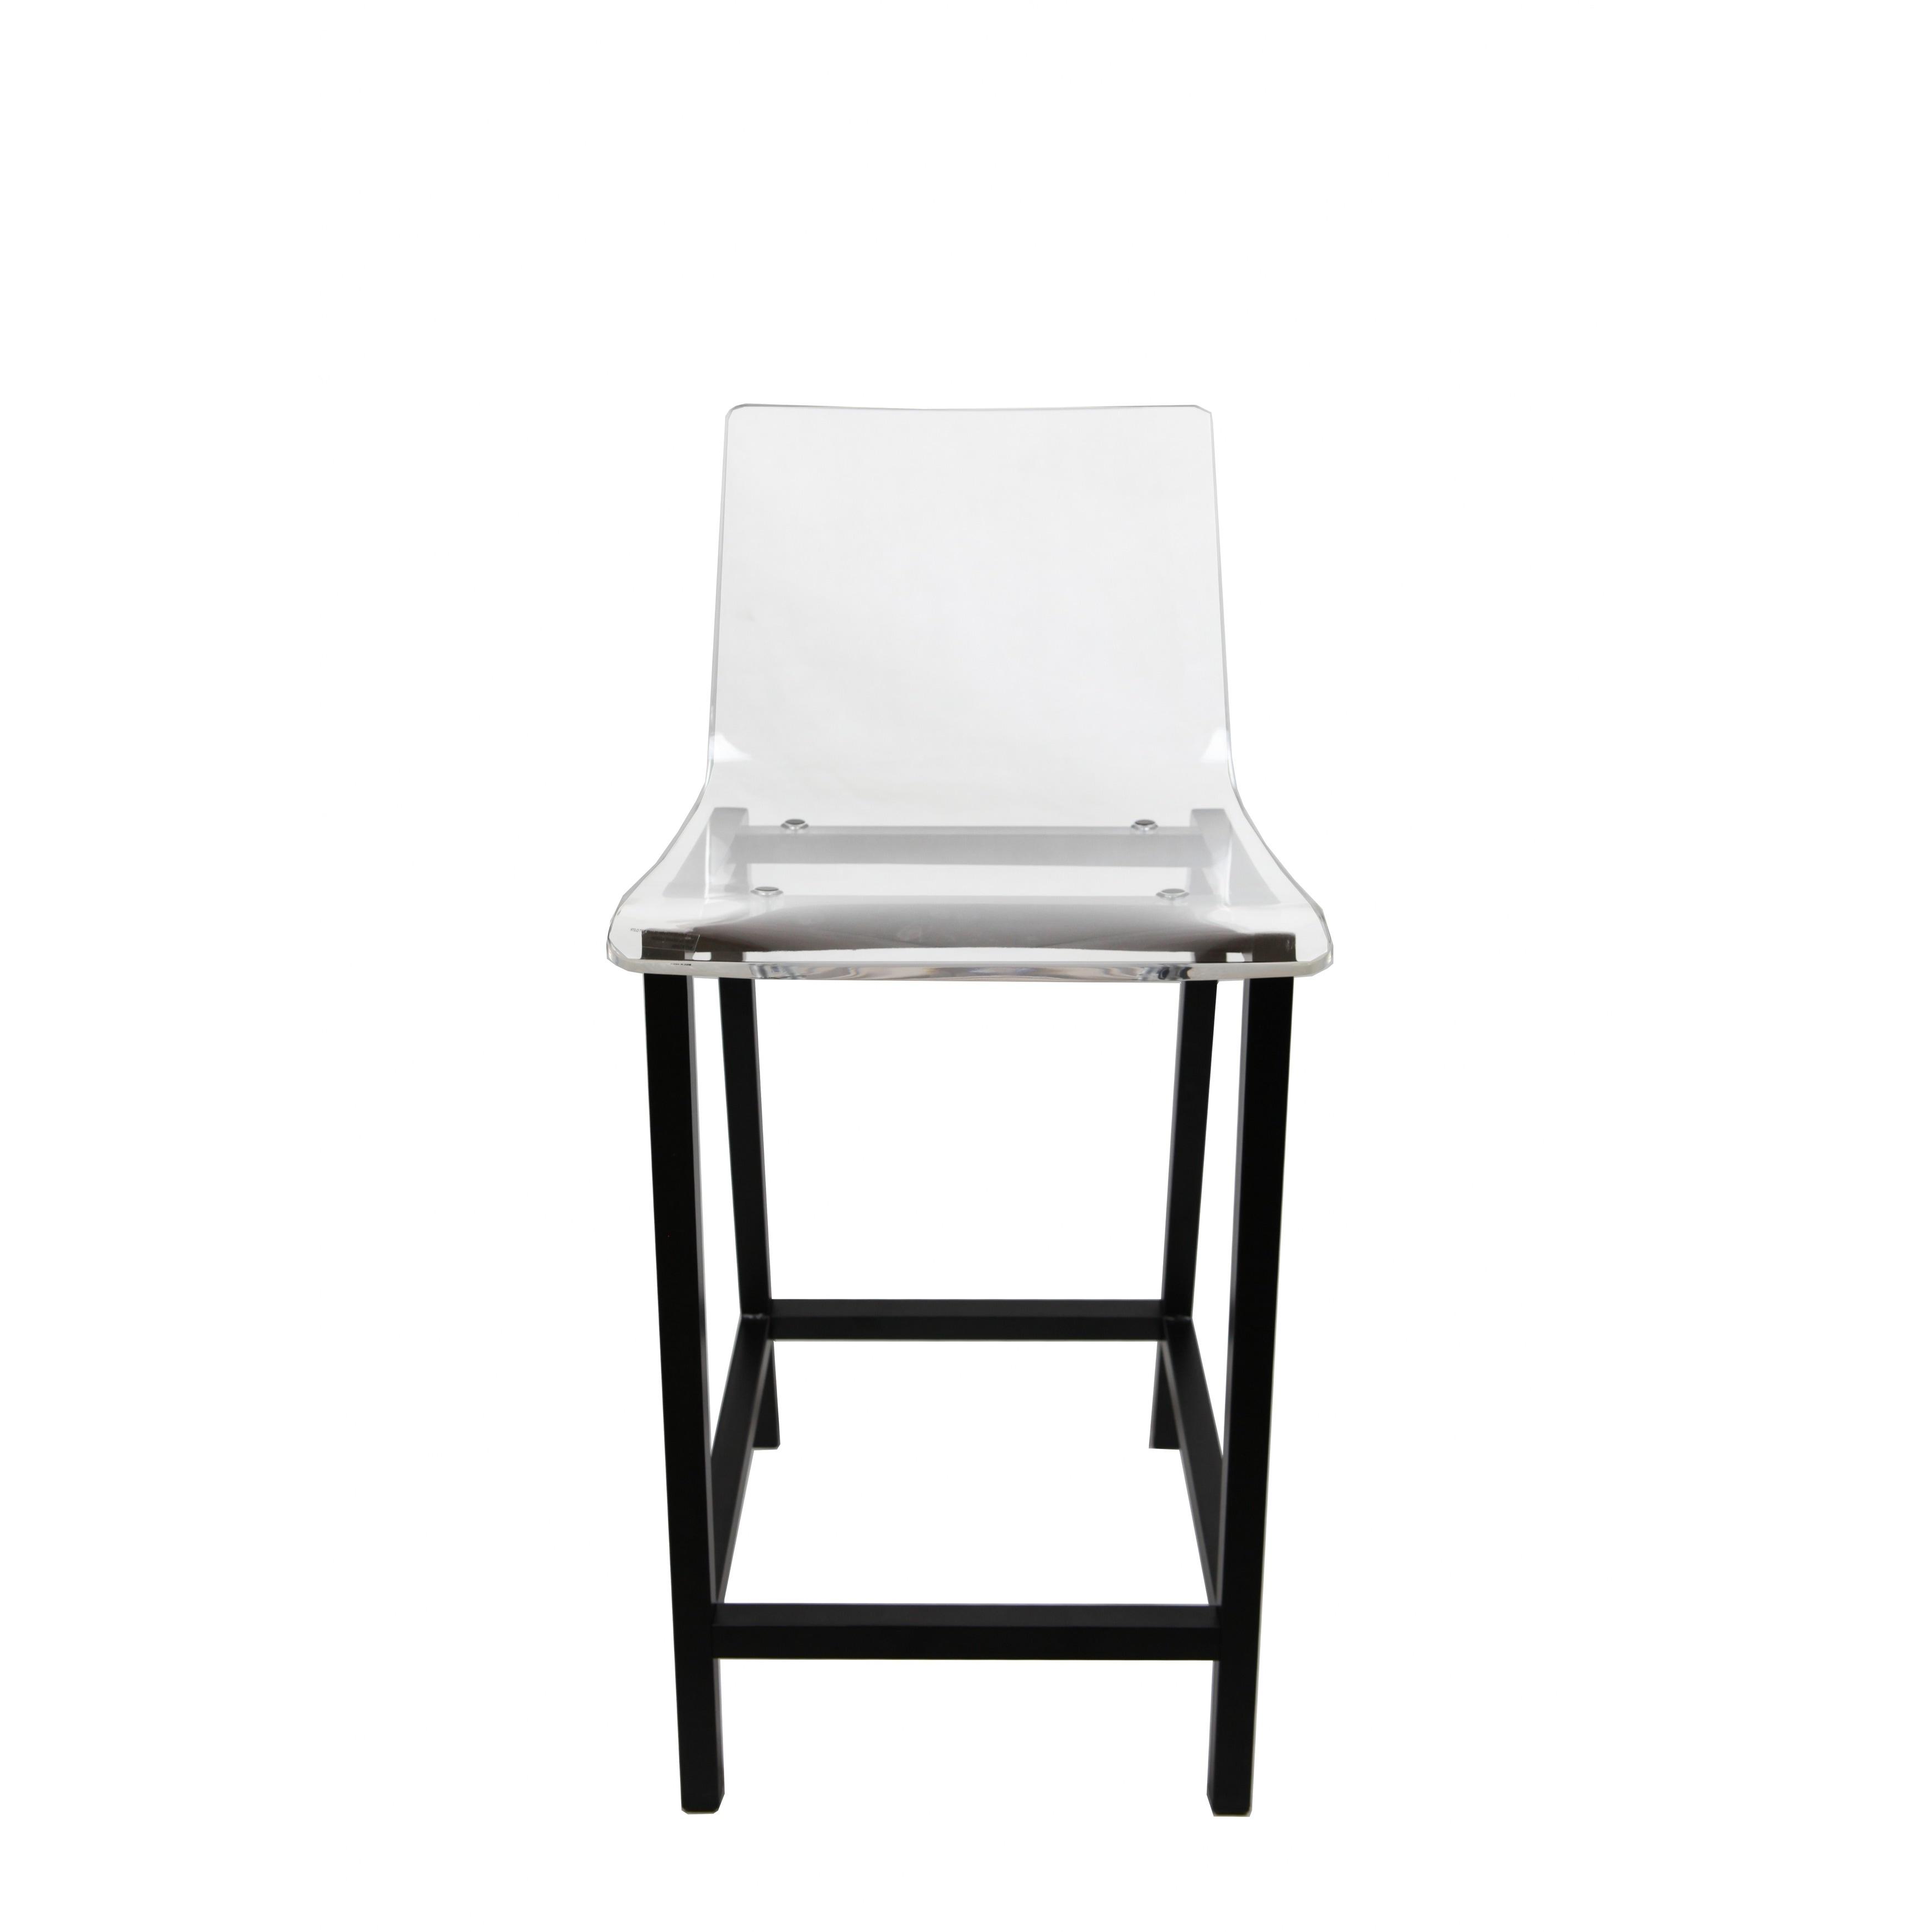 acrylic stools attachment and designrhparkandoakcom stool gabby oak interior park hayneedlerhhayneedlecom bar johnson counter trends barstools